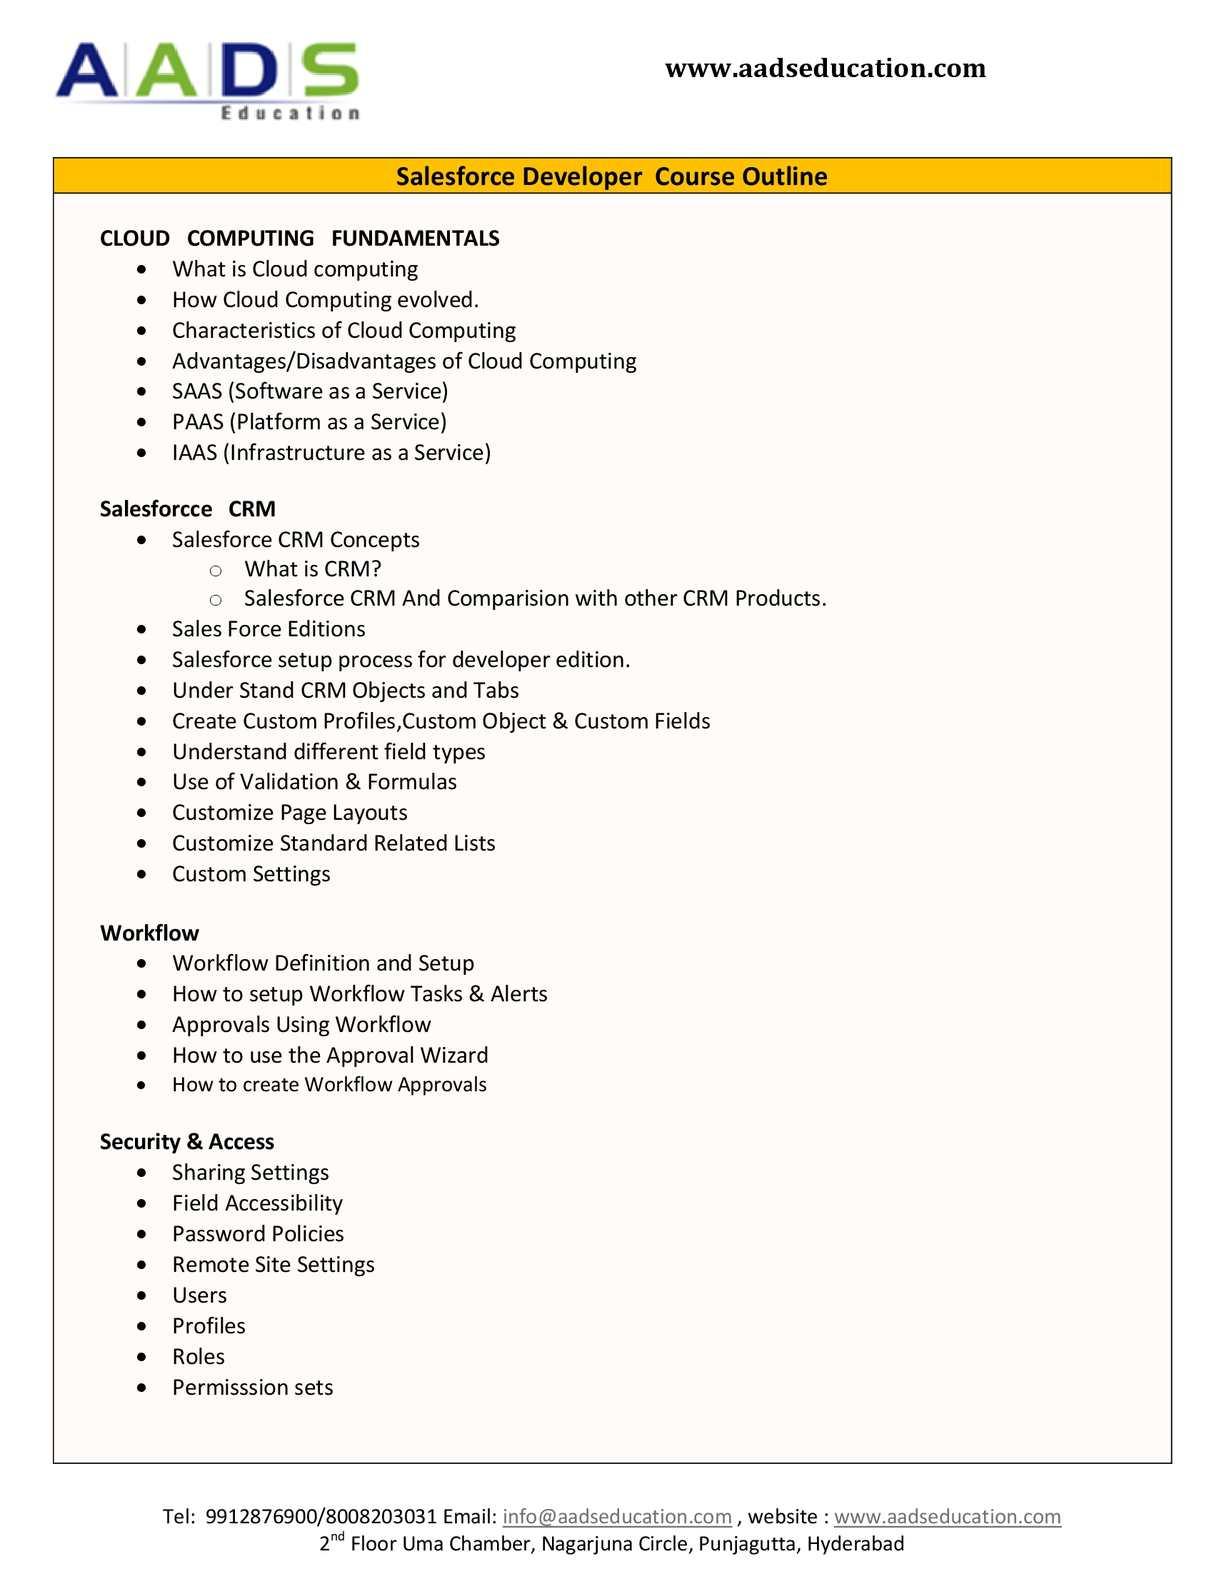 Calaméo - SalesForce CRM training Program in Hyderabad